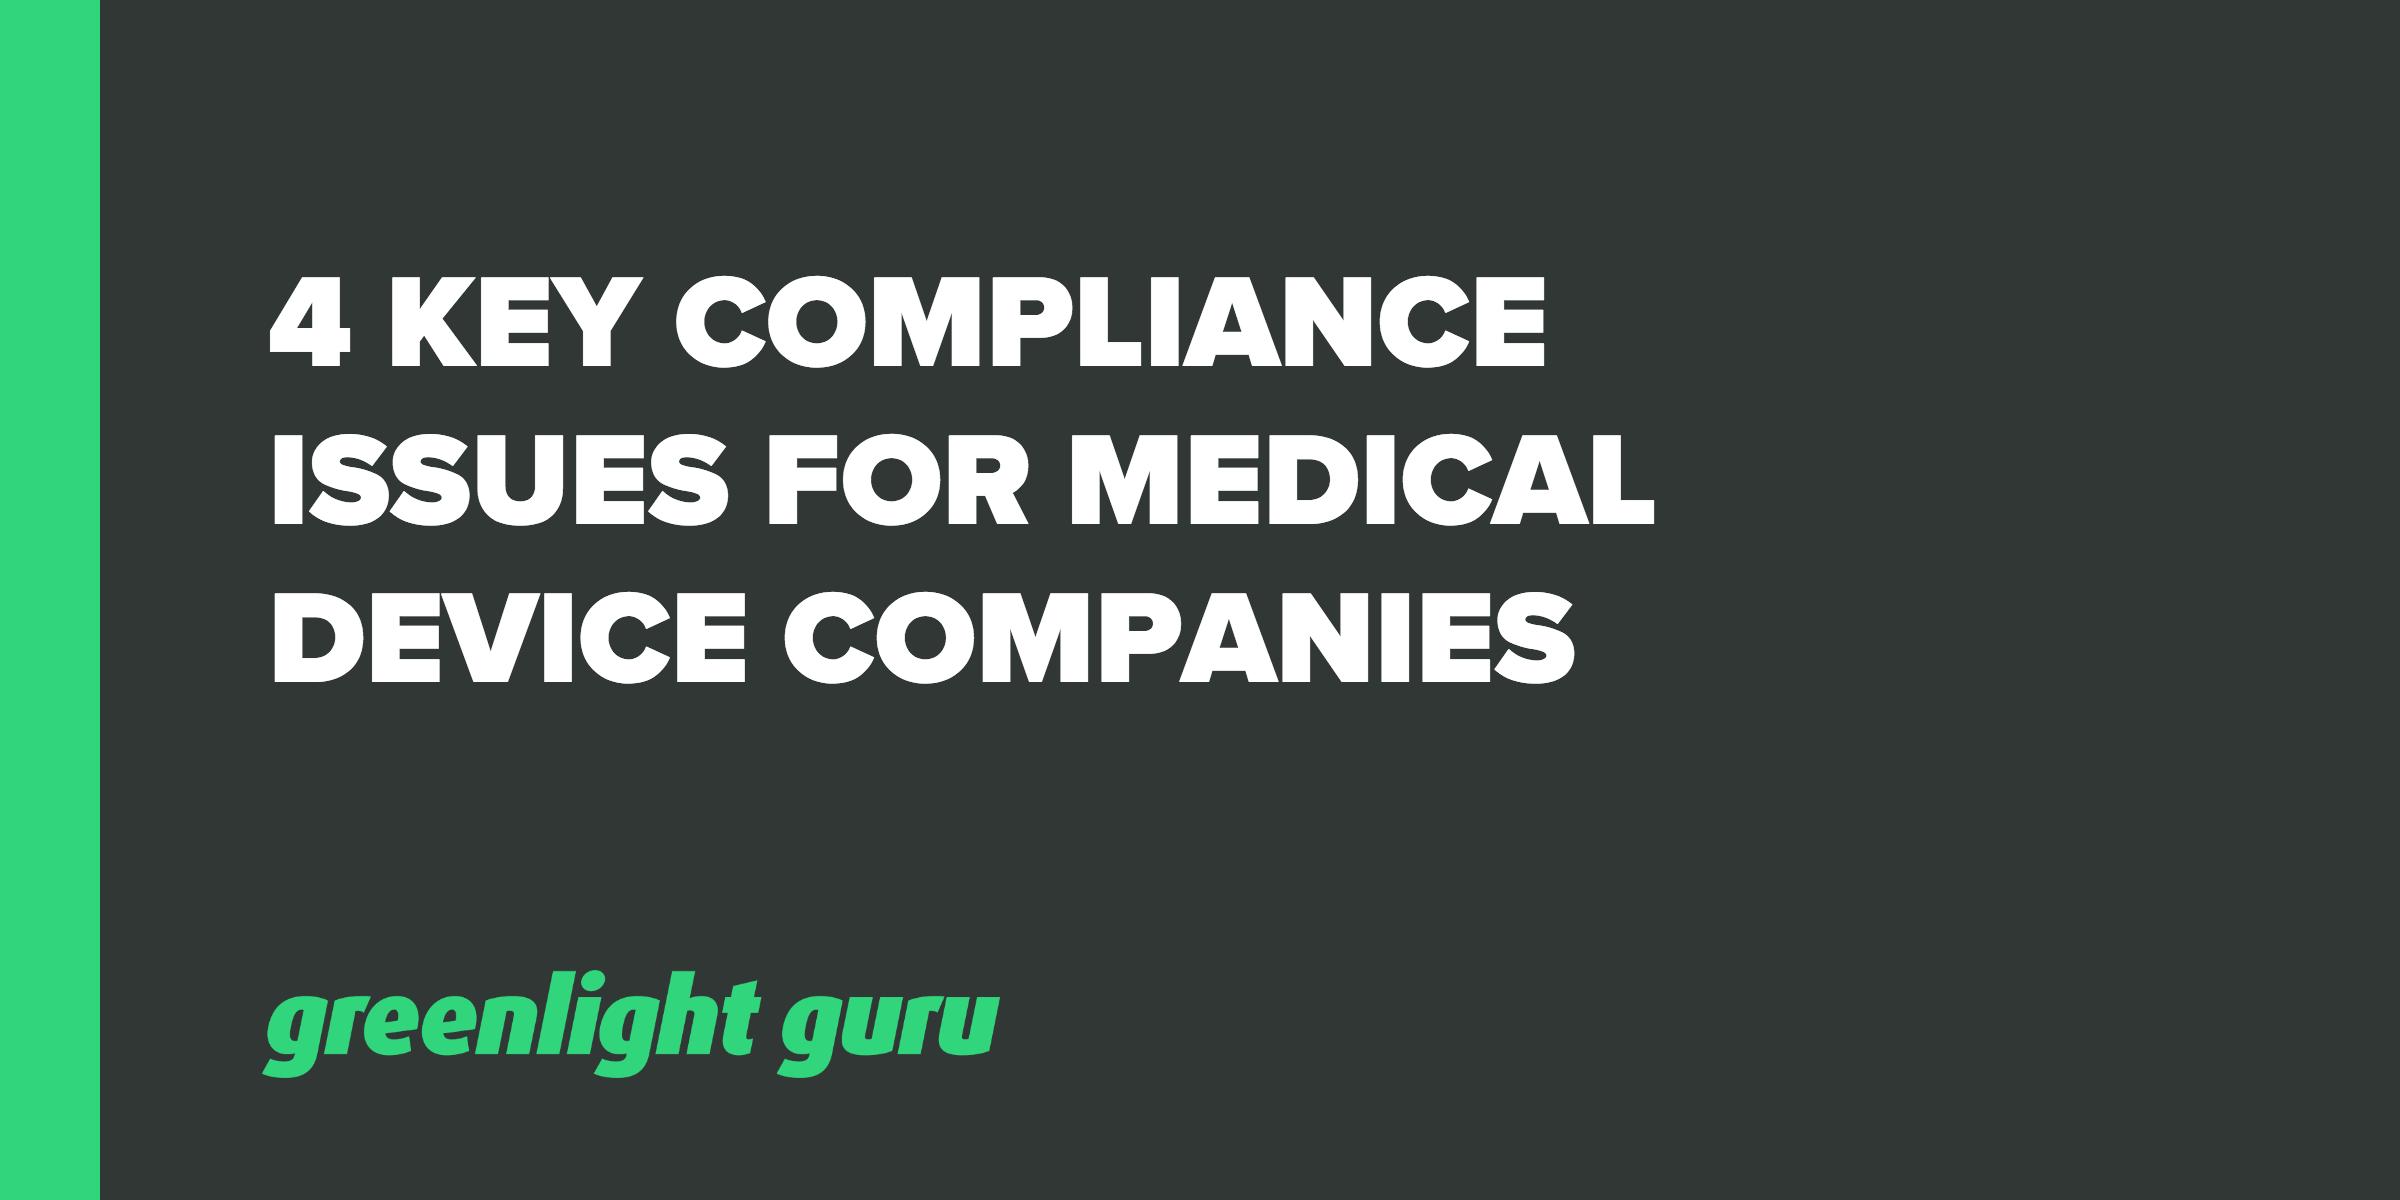 4 key compliance